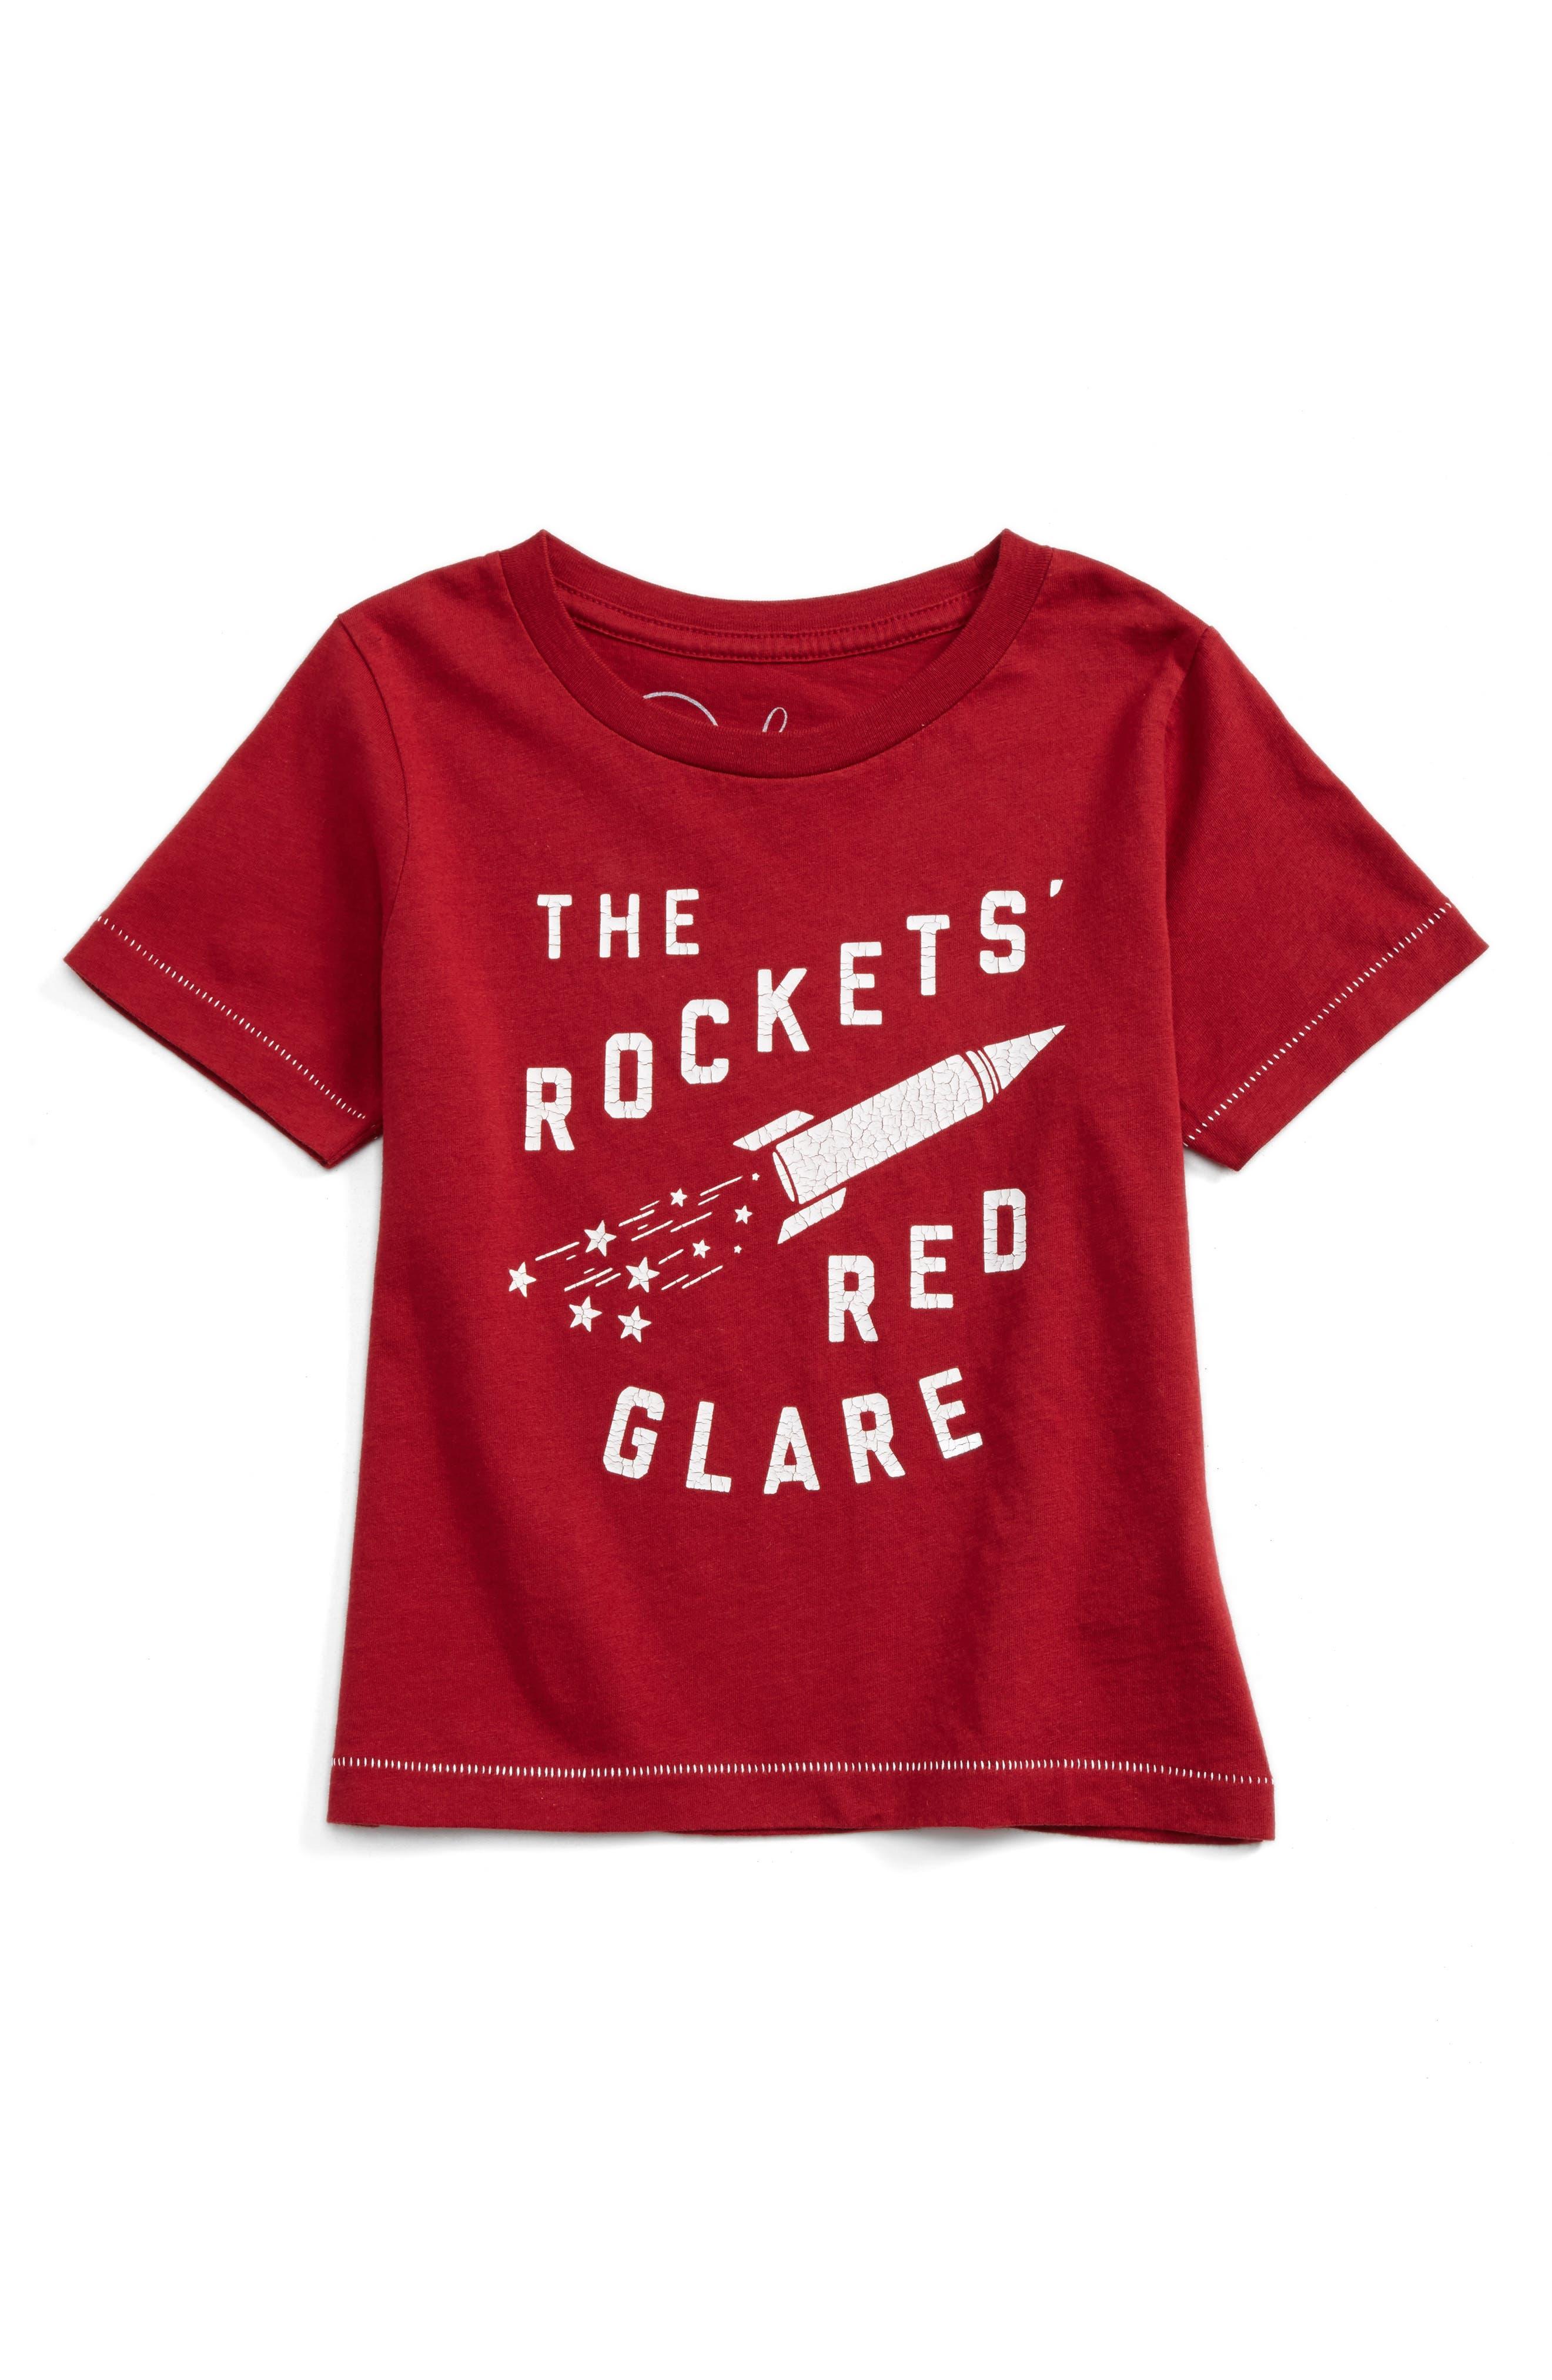 Main Image - Peek Rockets' Red Glare T-Shirt (Toddler Boys, Little Boys & Big Boys)